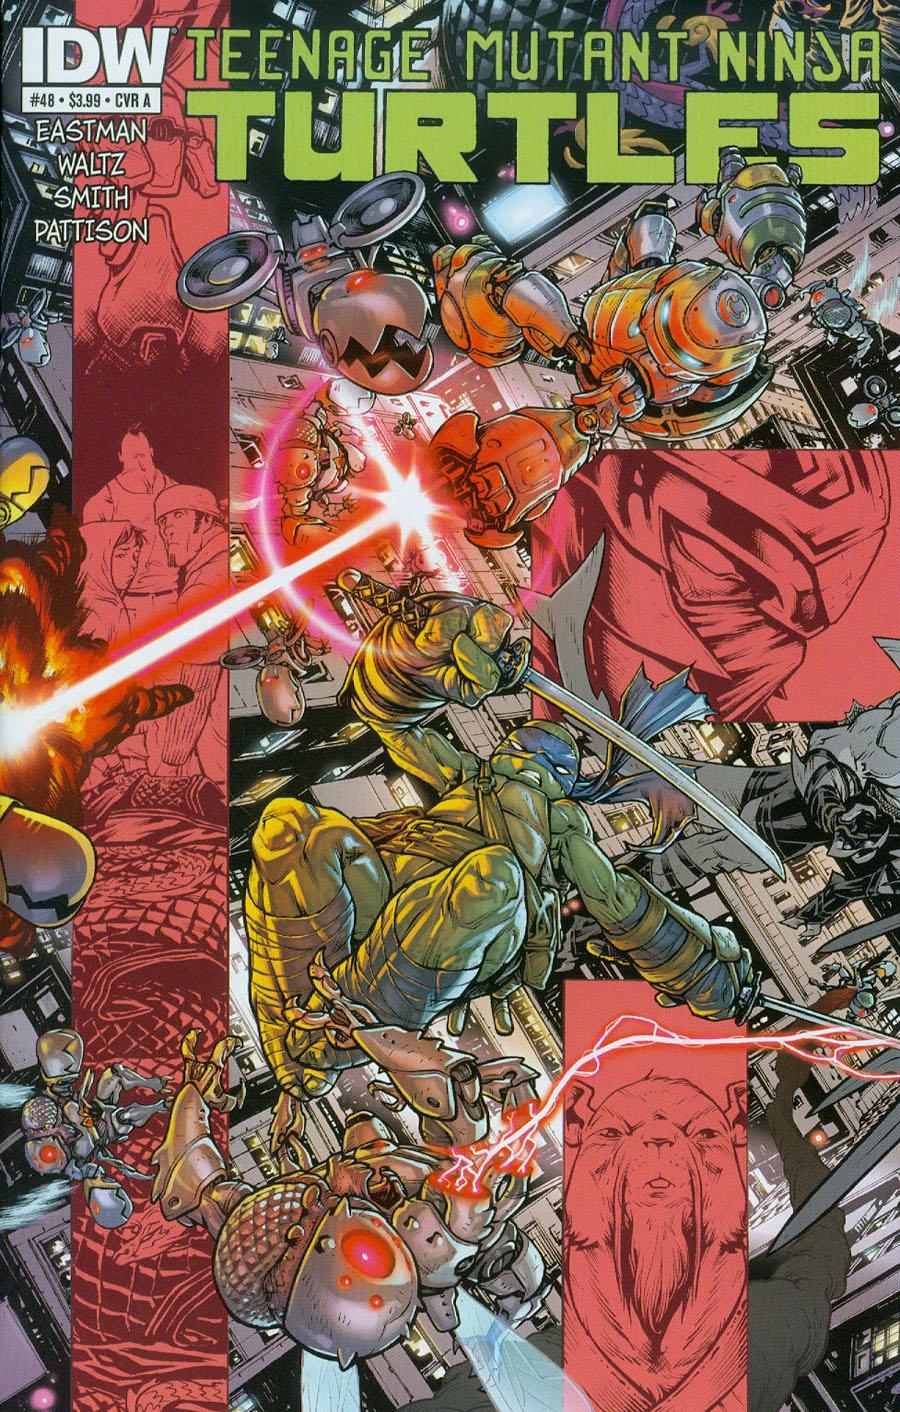 Teenage Mutant Ninja Turtles Vol 5 #48 Cover A Regular Mateus Santolouco Cover